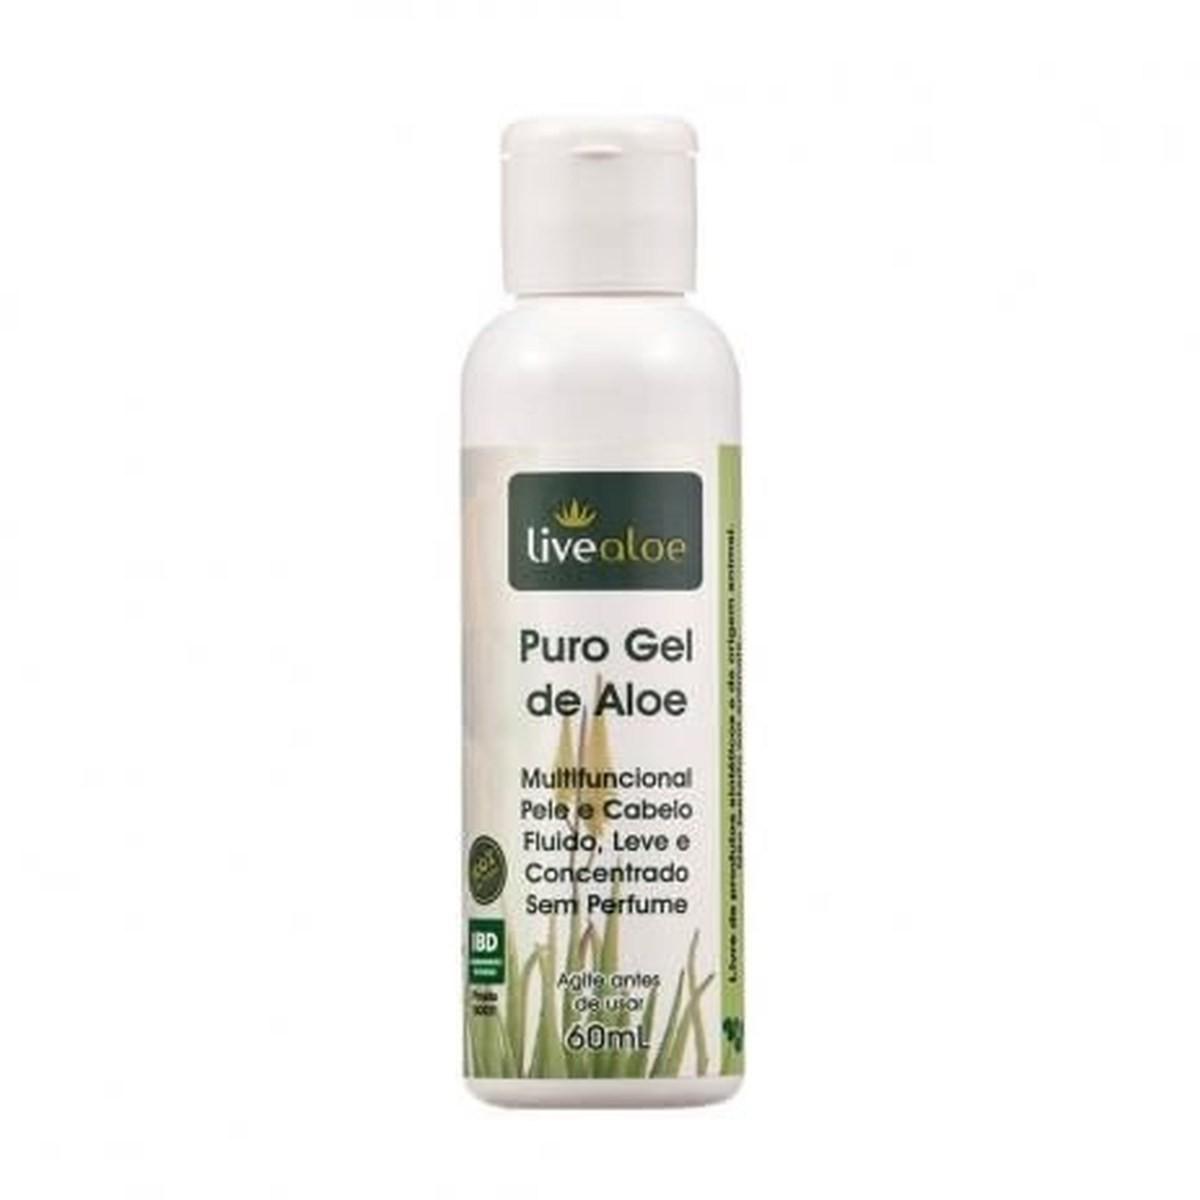 Puro Gel de Aloe Vera Natural e Vegano Livealoe 60 ml